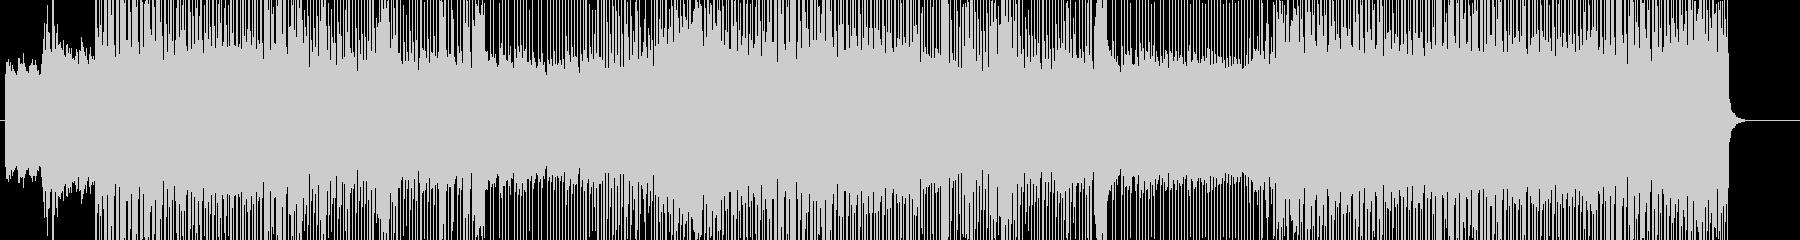 HARDROCK・POWER 312の未再生の波形